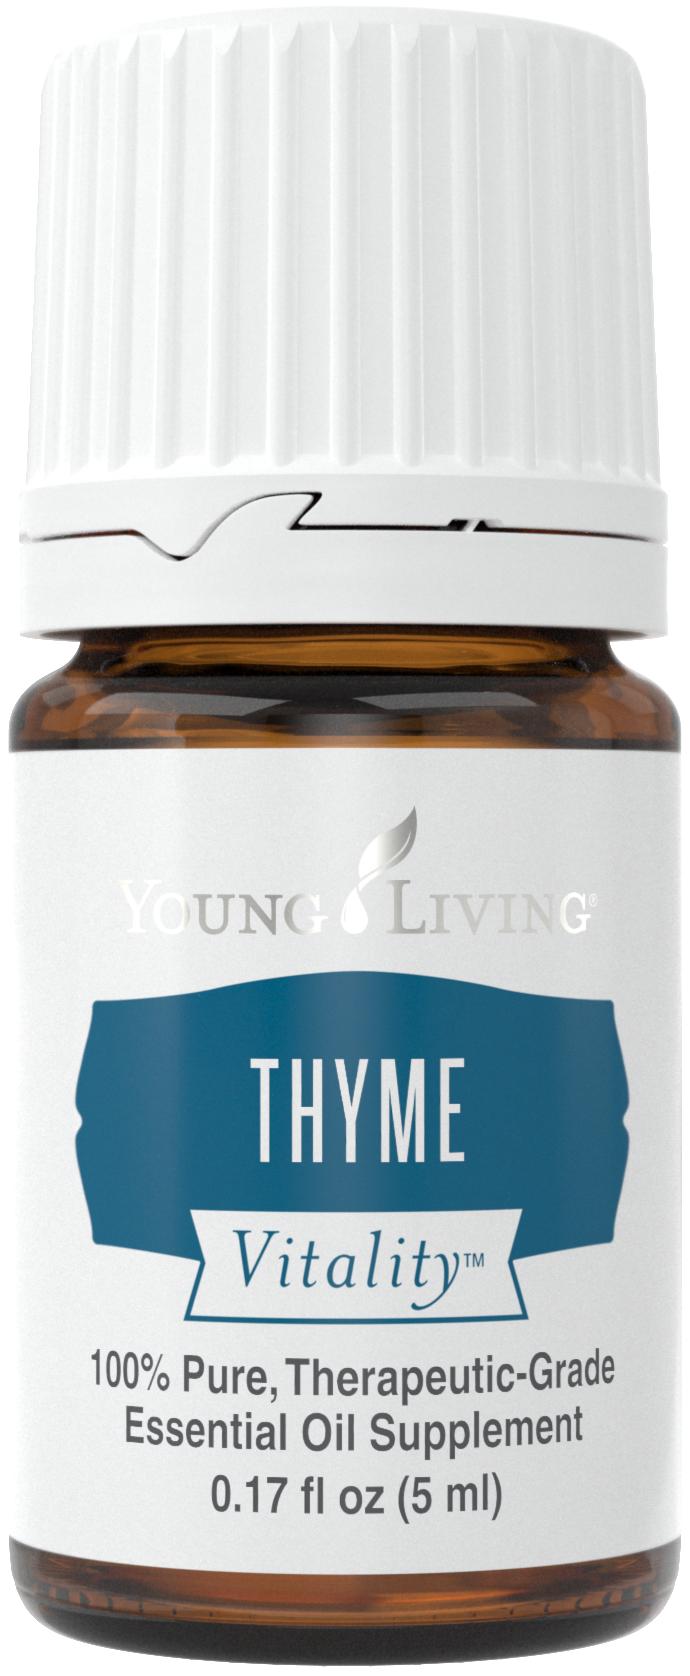 thyme_5ml_suplement_silo_2016_24402450055_o